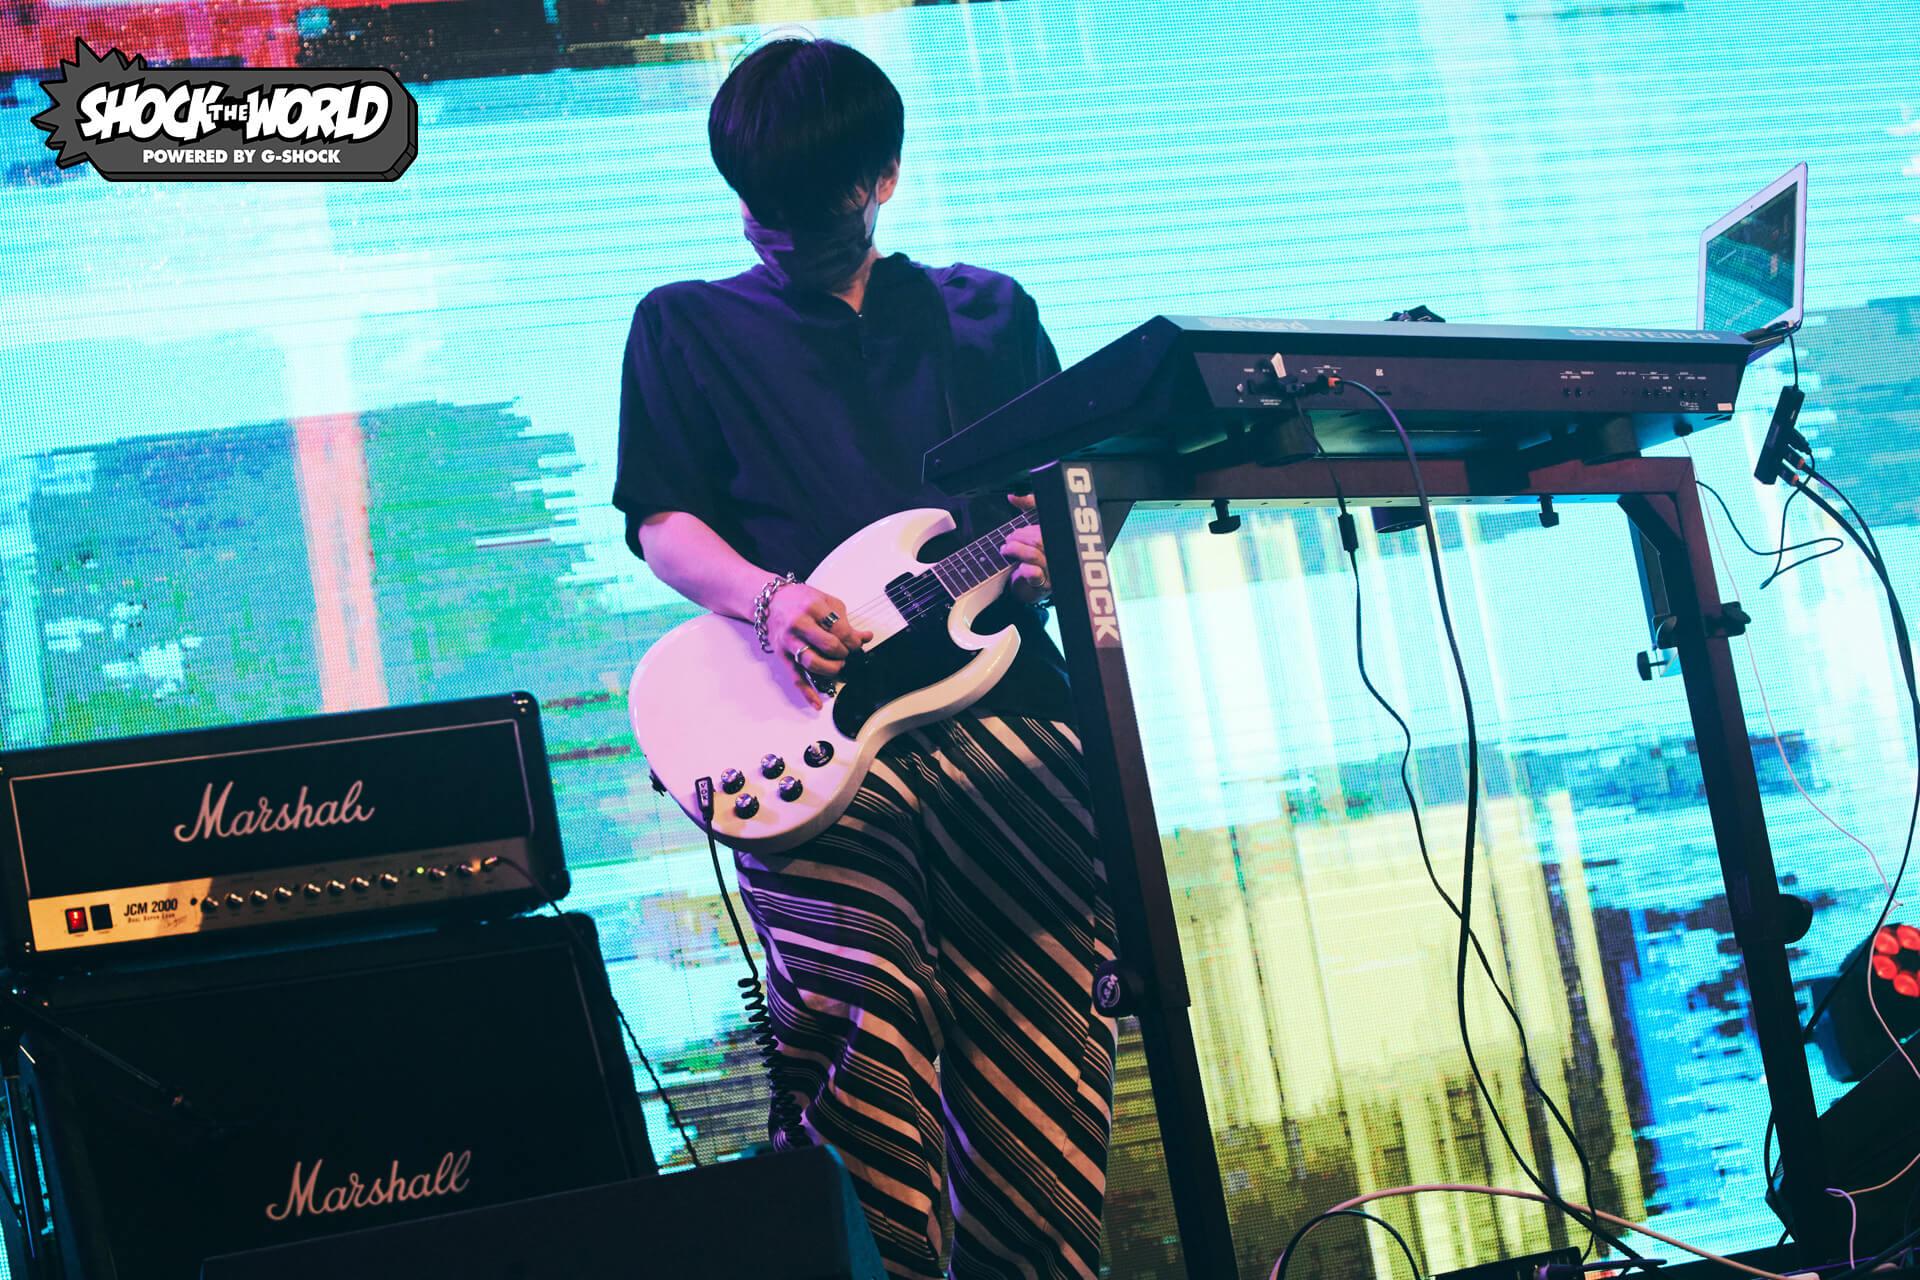 G-SHOCK『SHOCK THE WORLD』第6弾で80KIDZ、あっこゴリラ、YonYonのトーク&ライブセッションが実現! music210804_shocktheworld_3